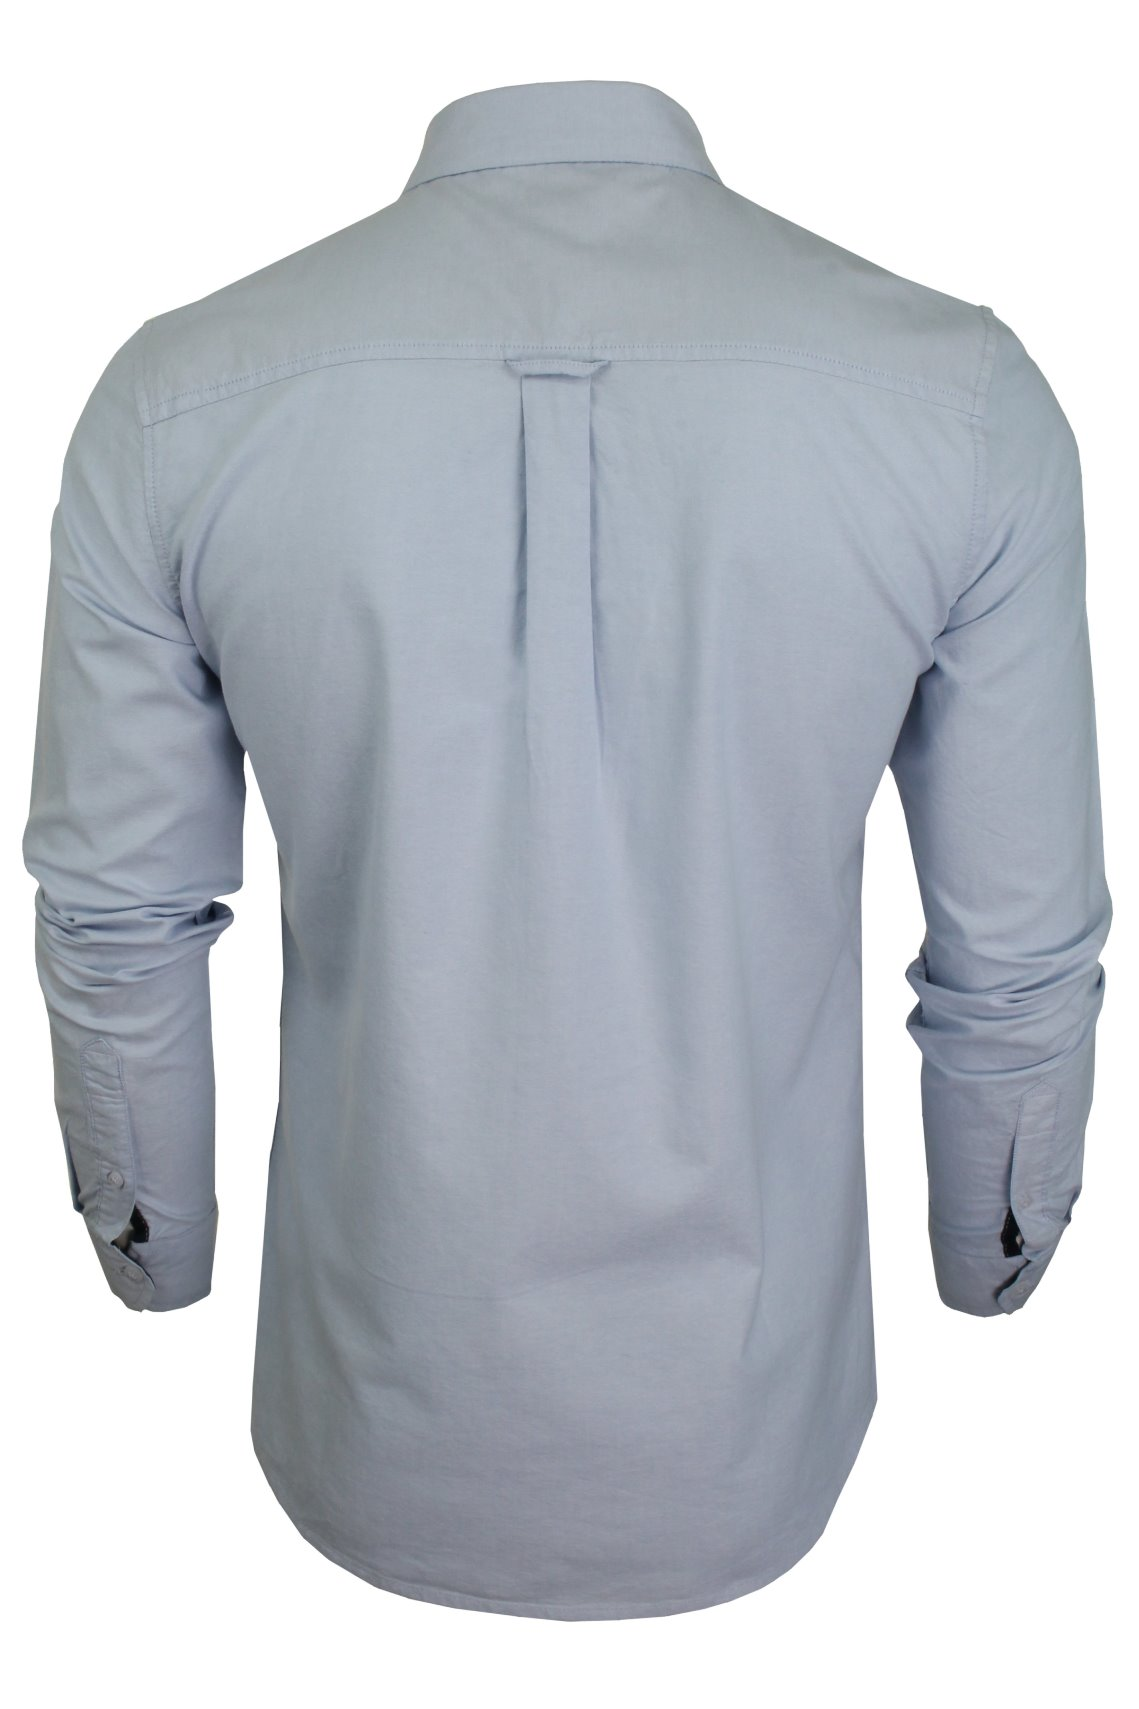 Xact-Long-Sleeved-Oxford-Shirt thumbnail 5